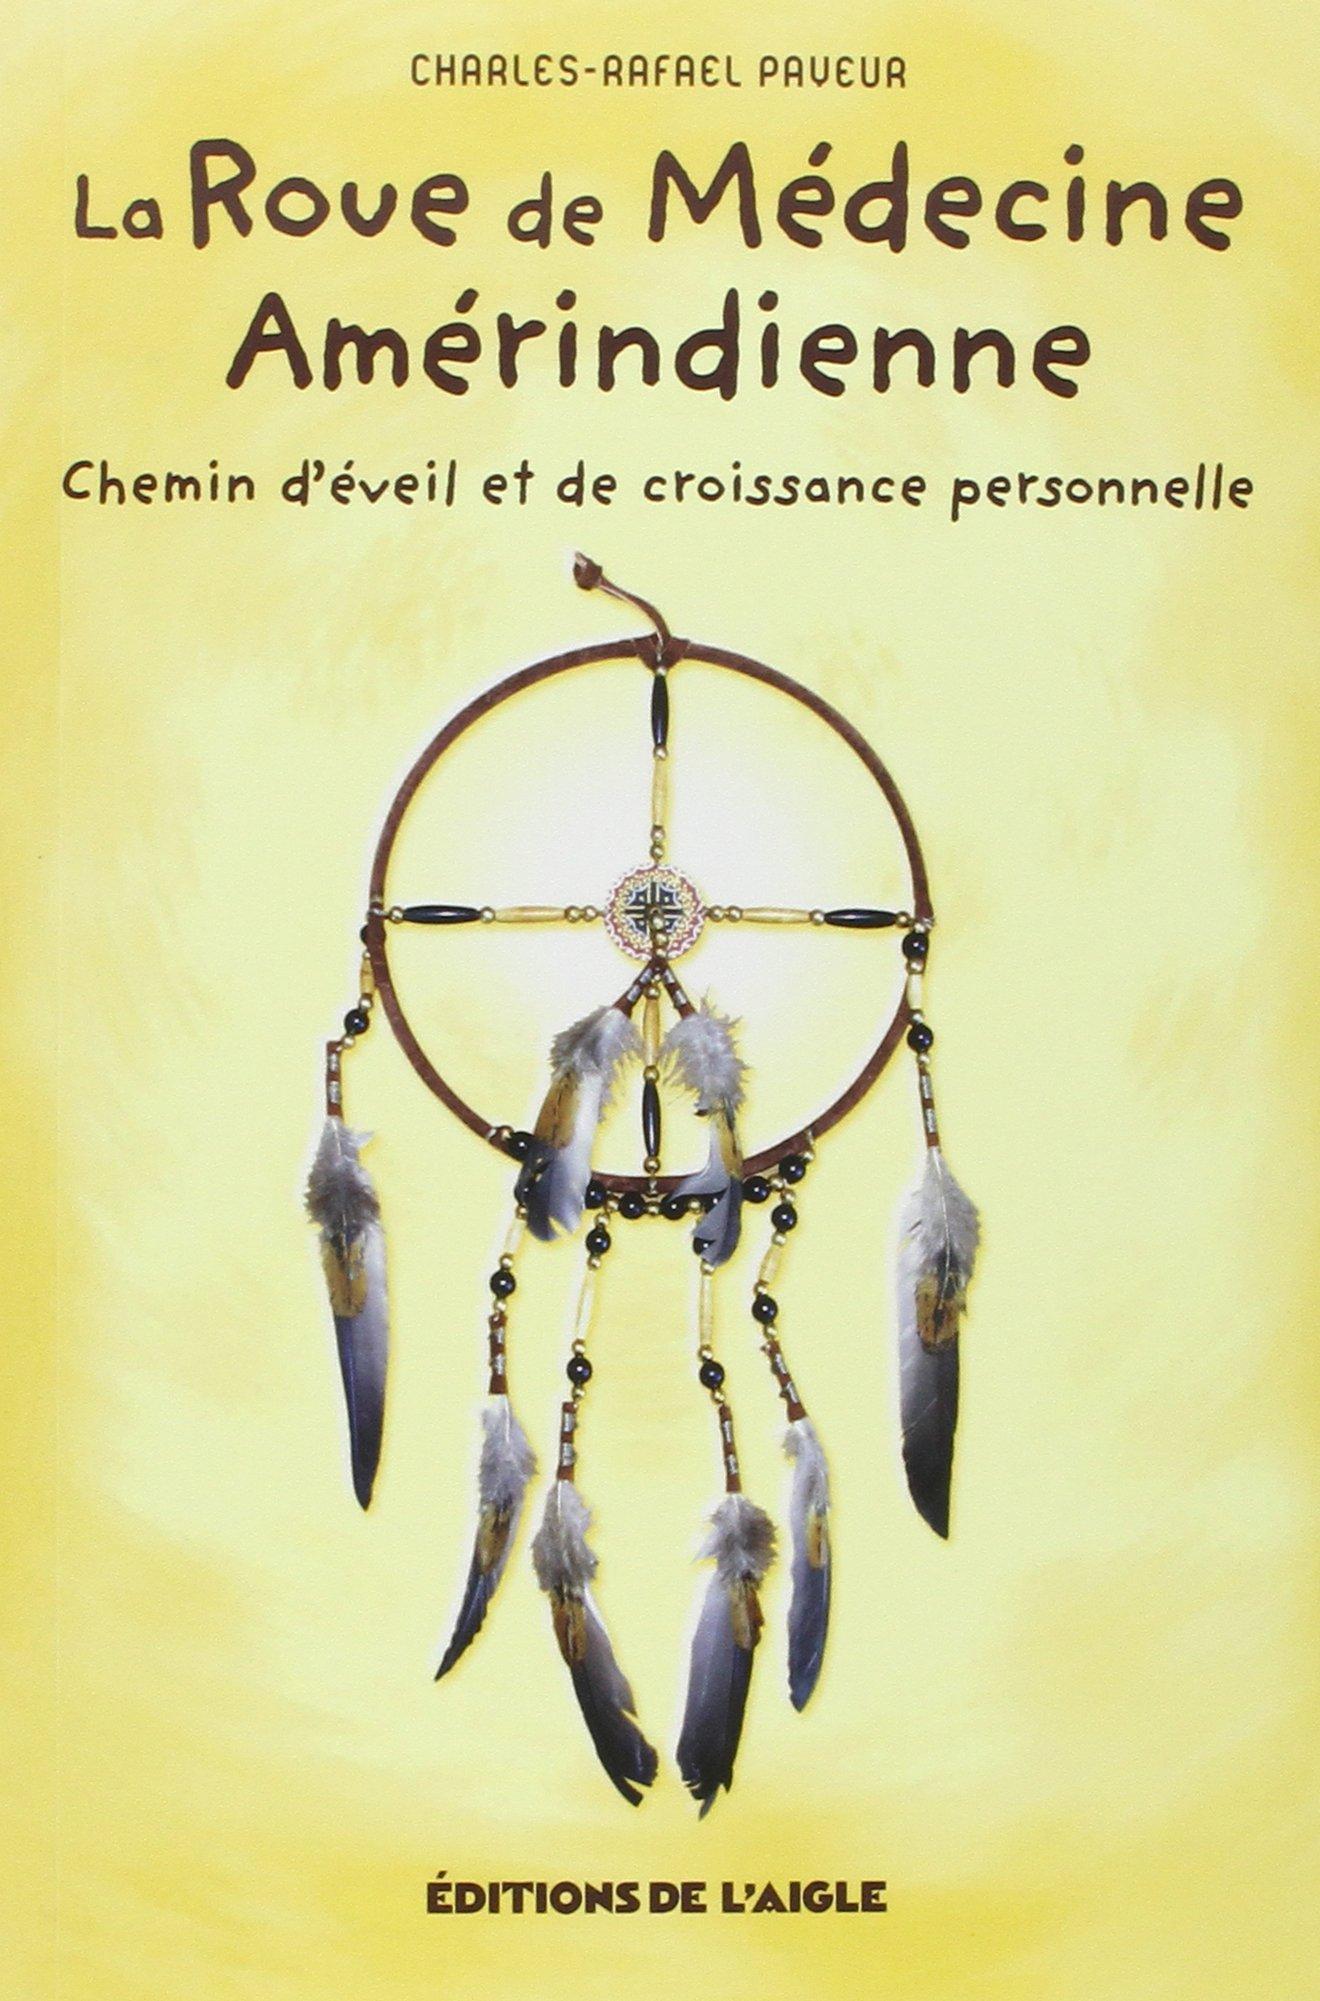 Amazon Fr Roue De Médecine Amérindienne Payeur Charles Rafaël Livres